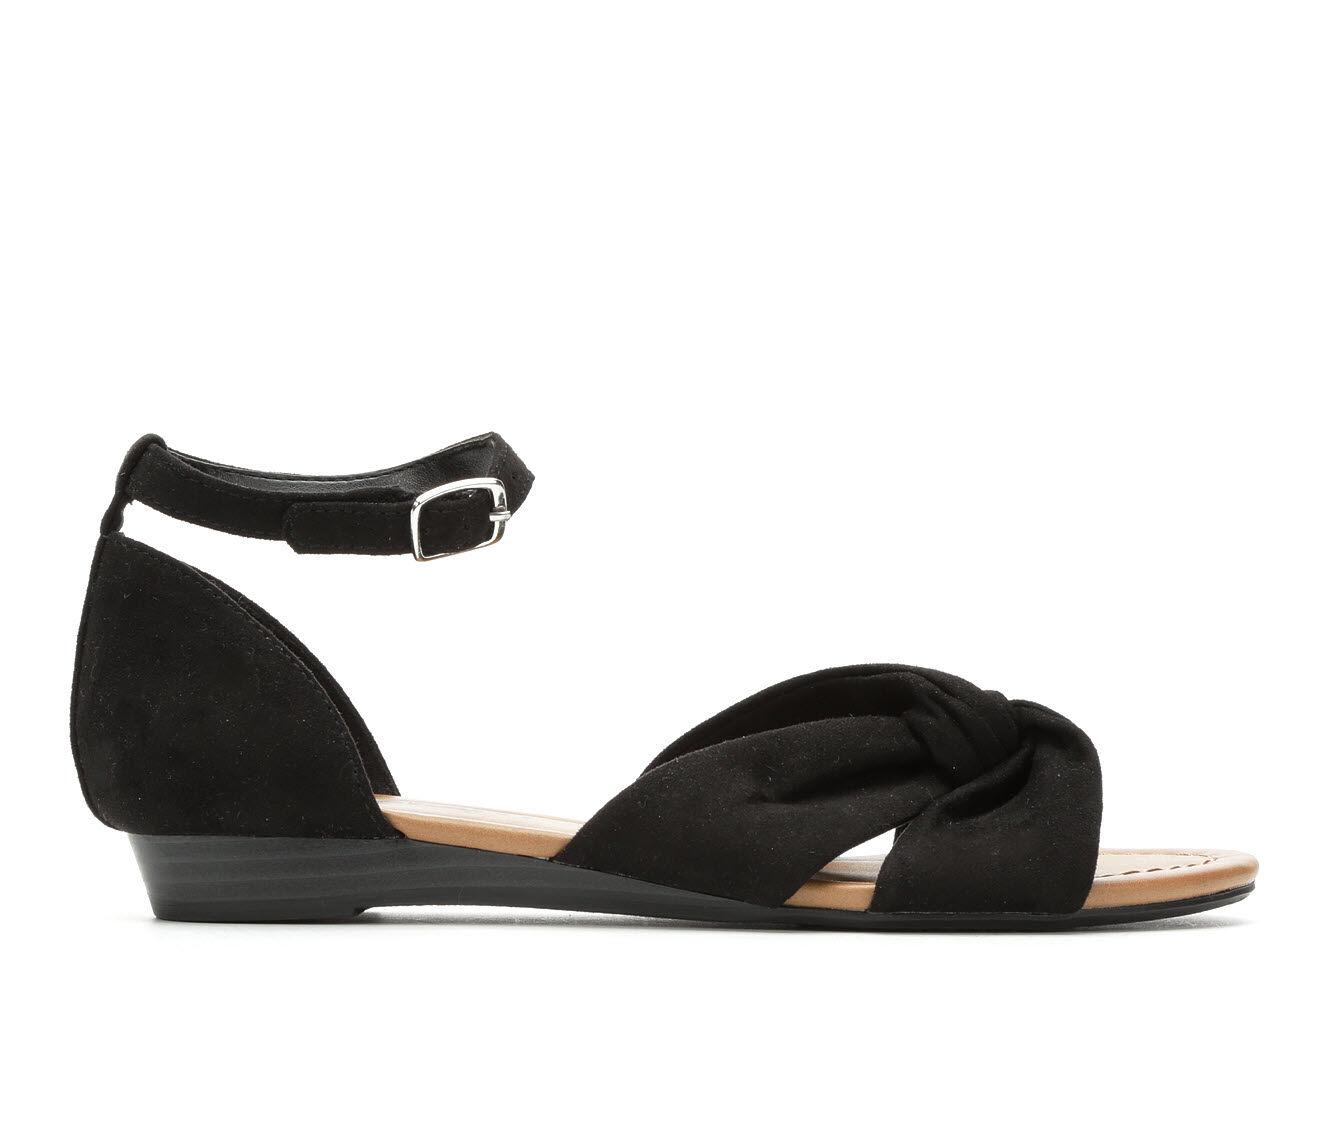 Women's Makalu Natty Strappy Sandals Black